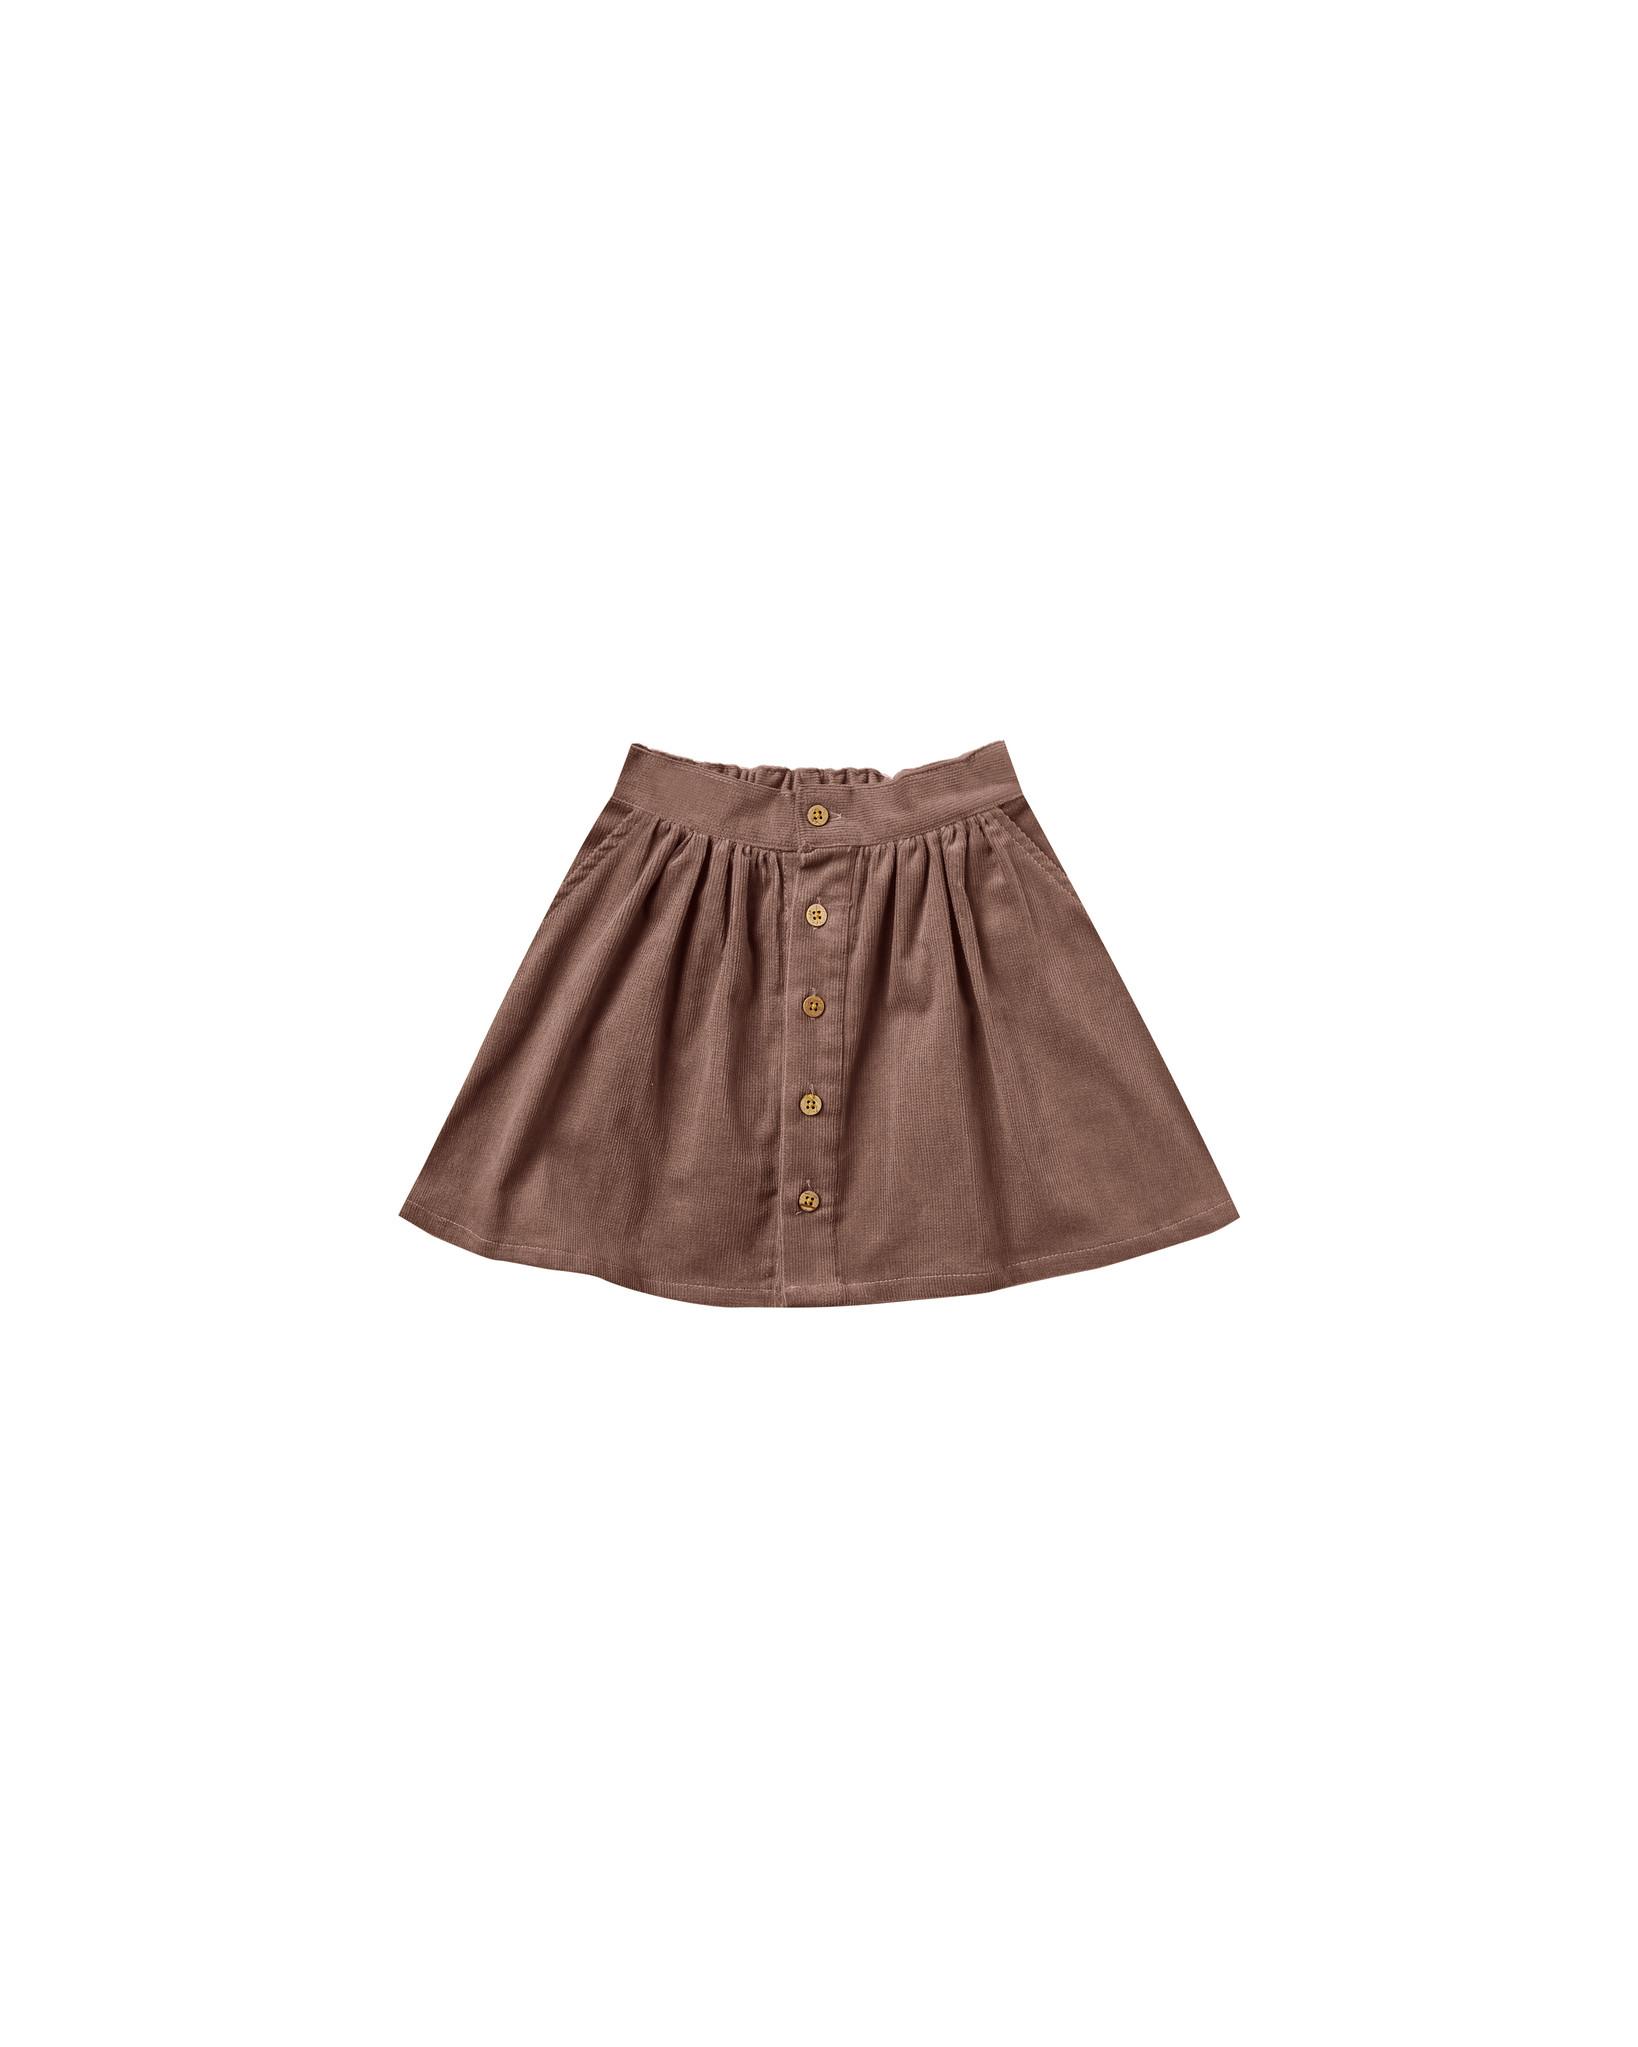 Rylee & Cru Button Front Mini Skirt - Wine